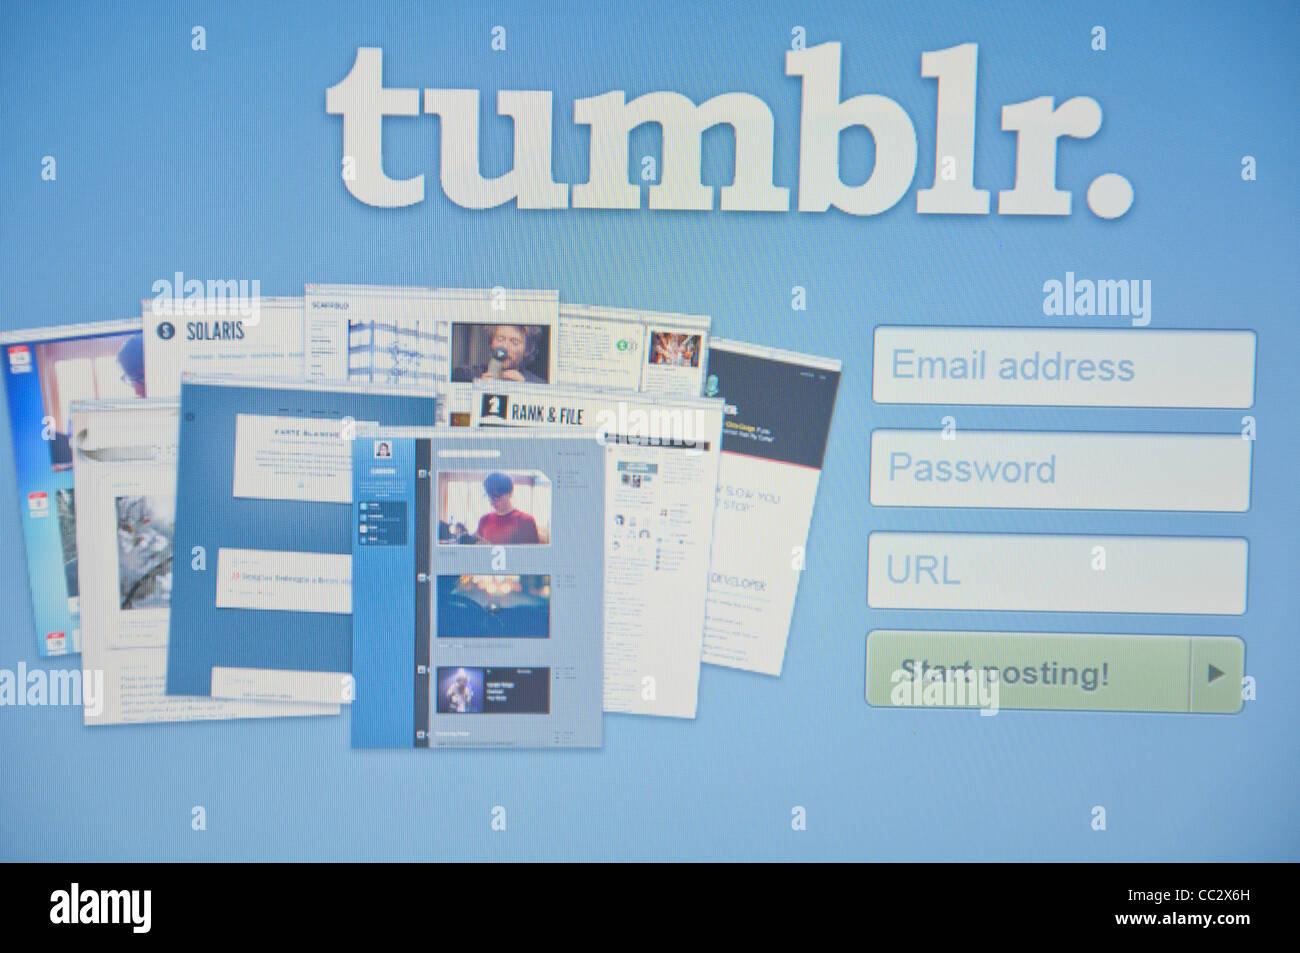 Tumblr Website Stock Photos & Tumblr Website Stock Images - Alamy